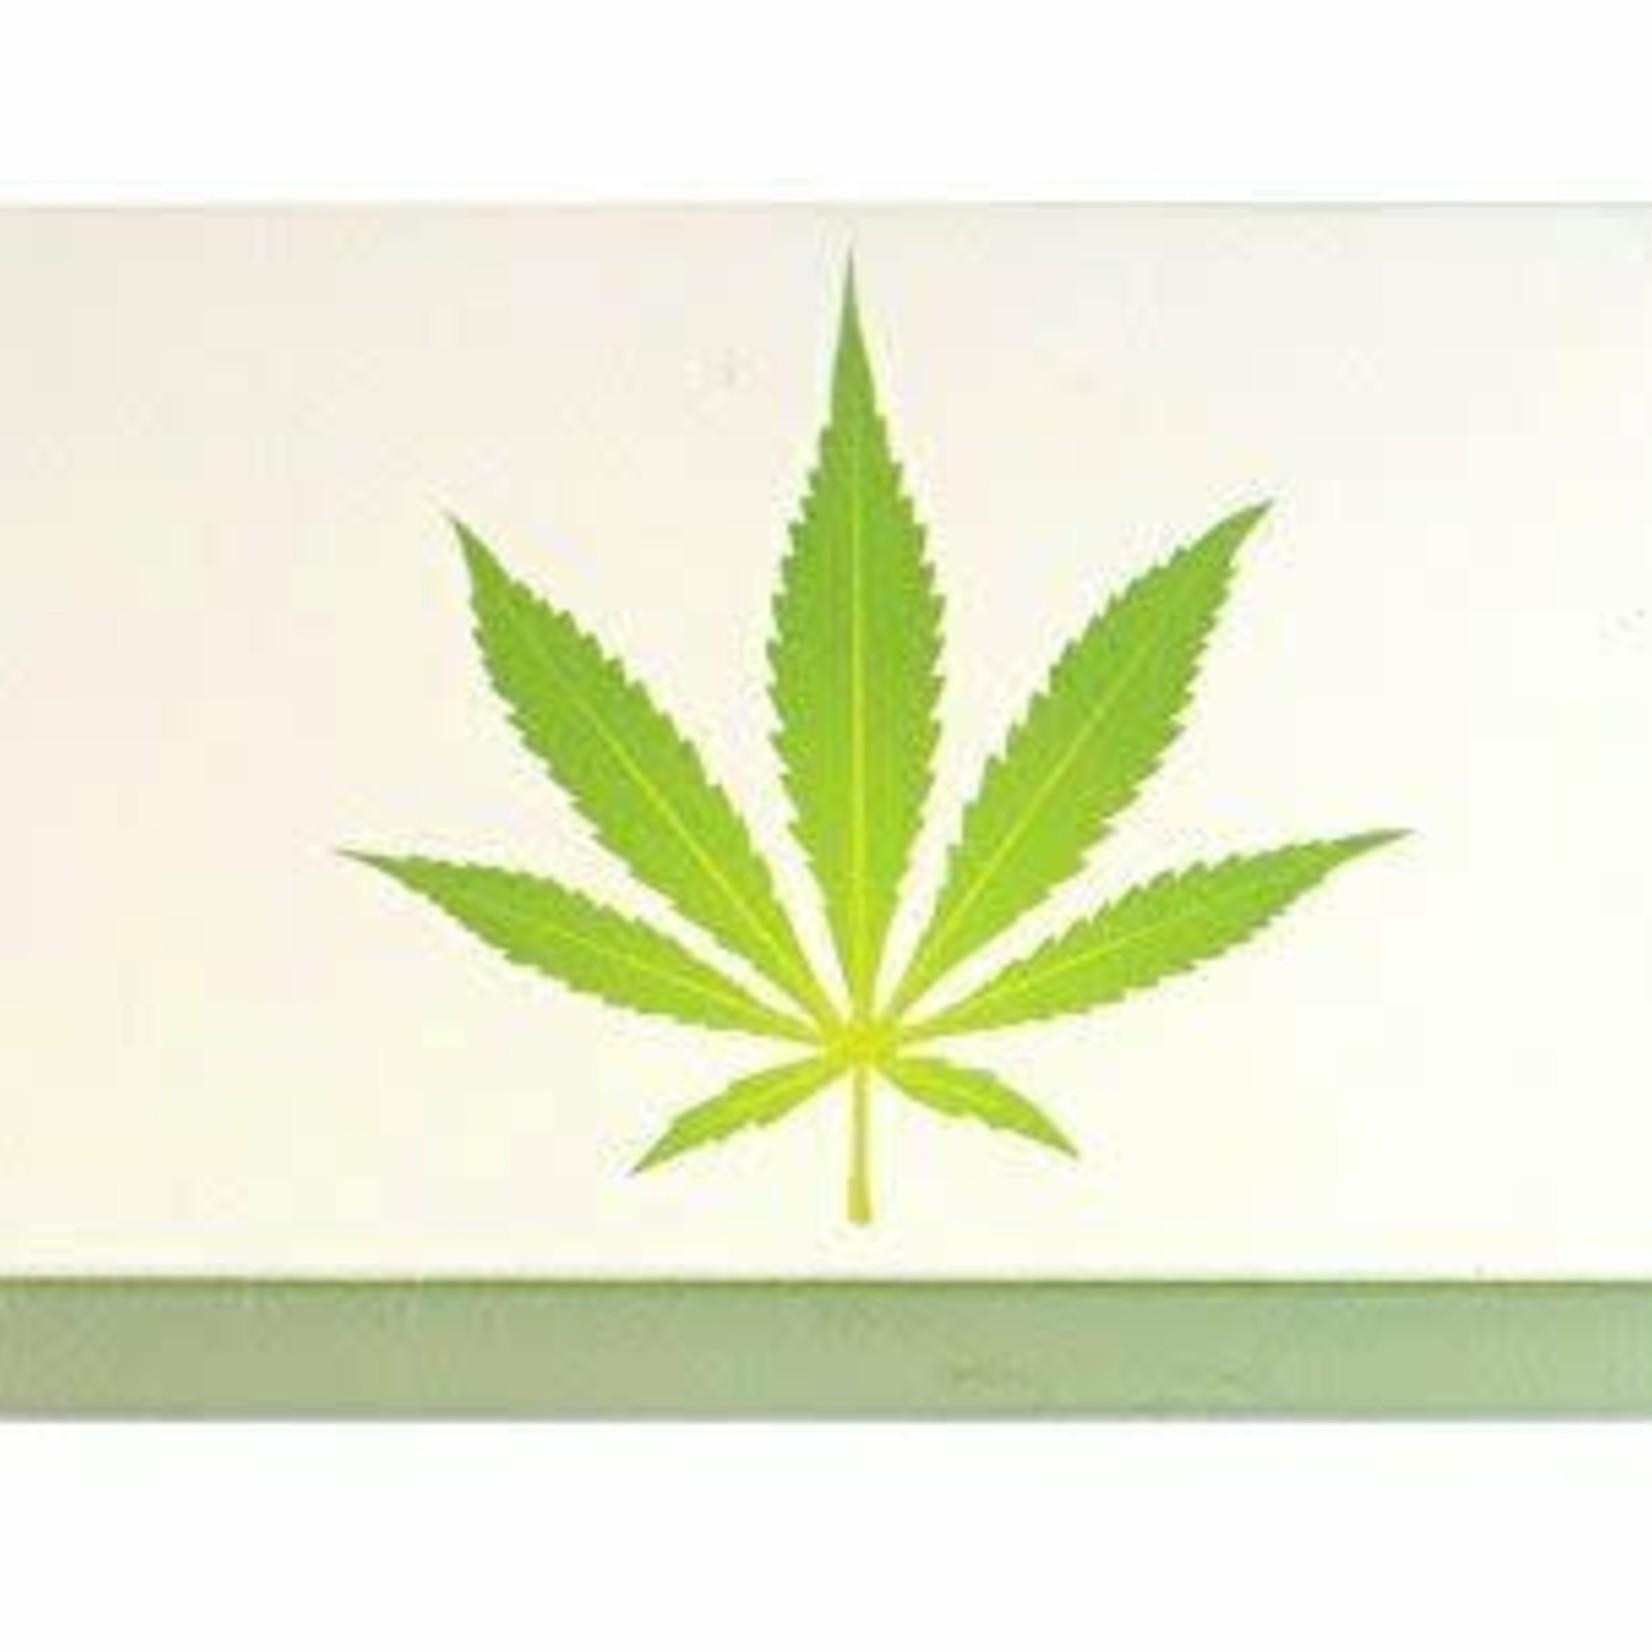 The Joy of Light Joy of Light Matchbook Marijuana Leaf